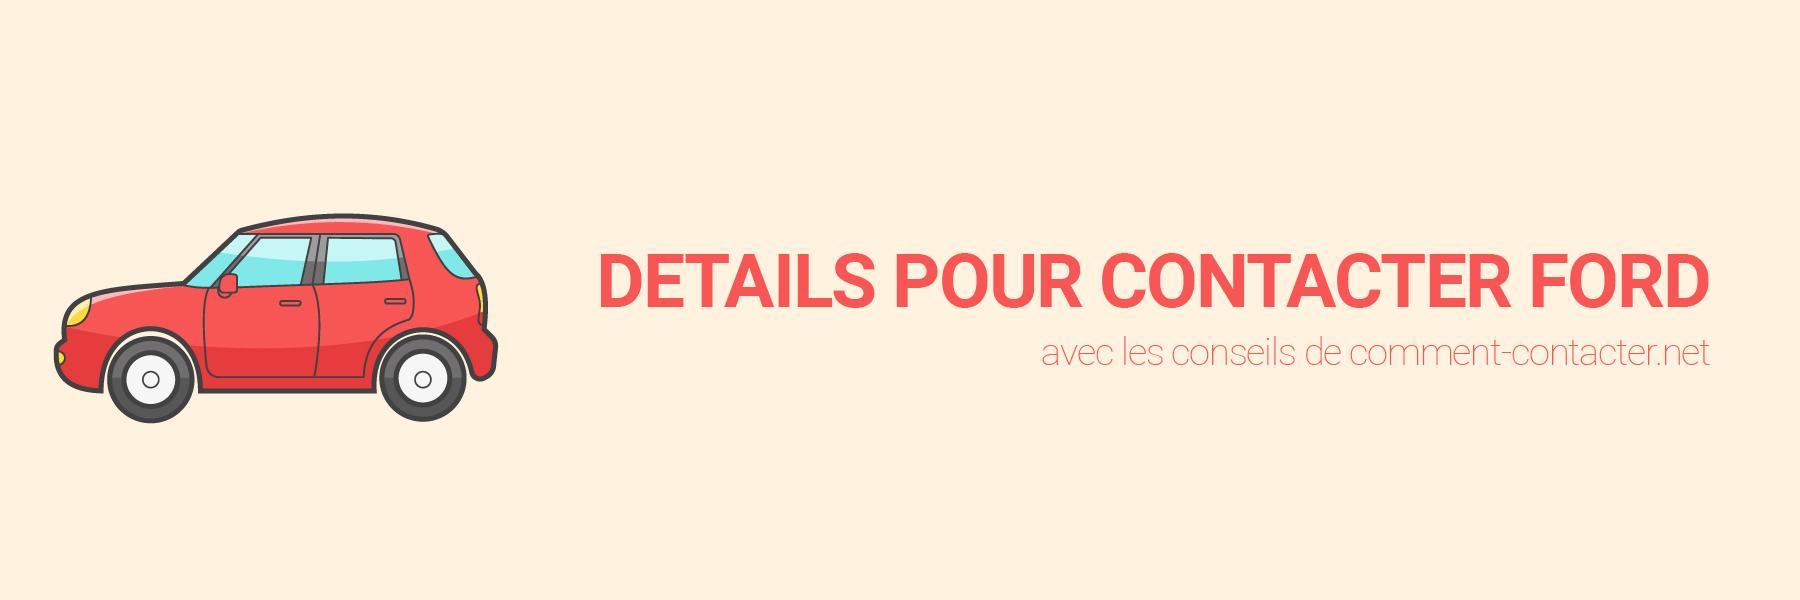 ford france service client marketing industriel 20 11 ppt t l charger certificat de conformit. Black Bedroom Furniture Sets. Home Design Ideas